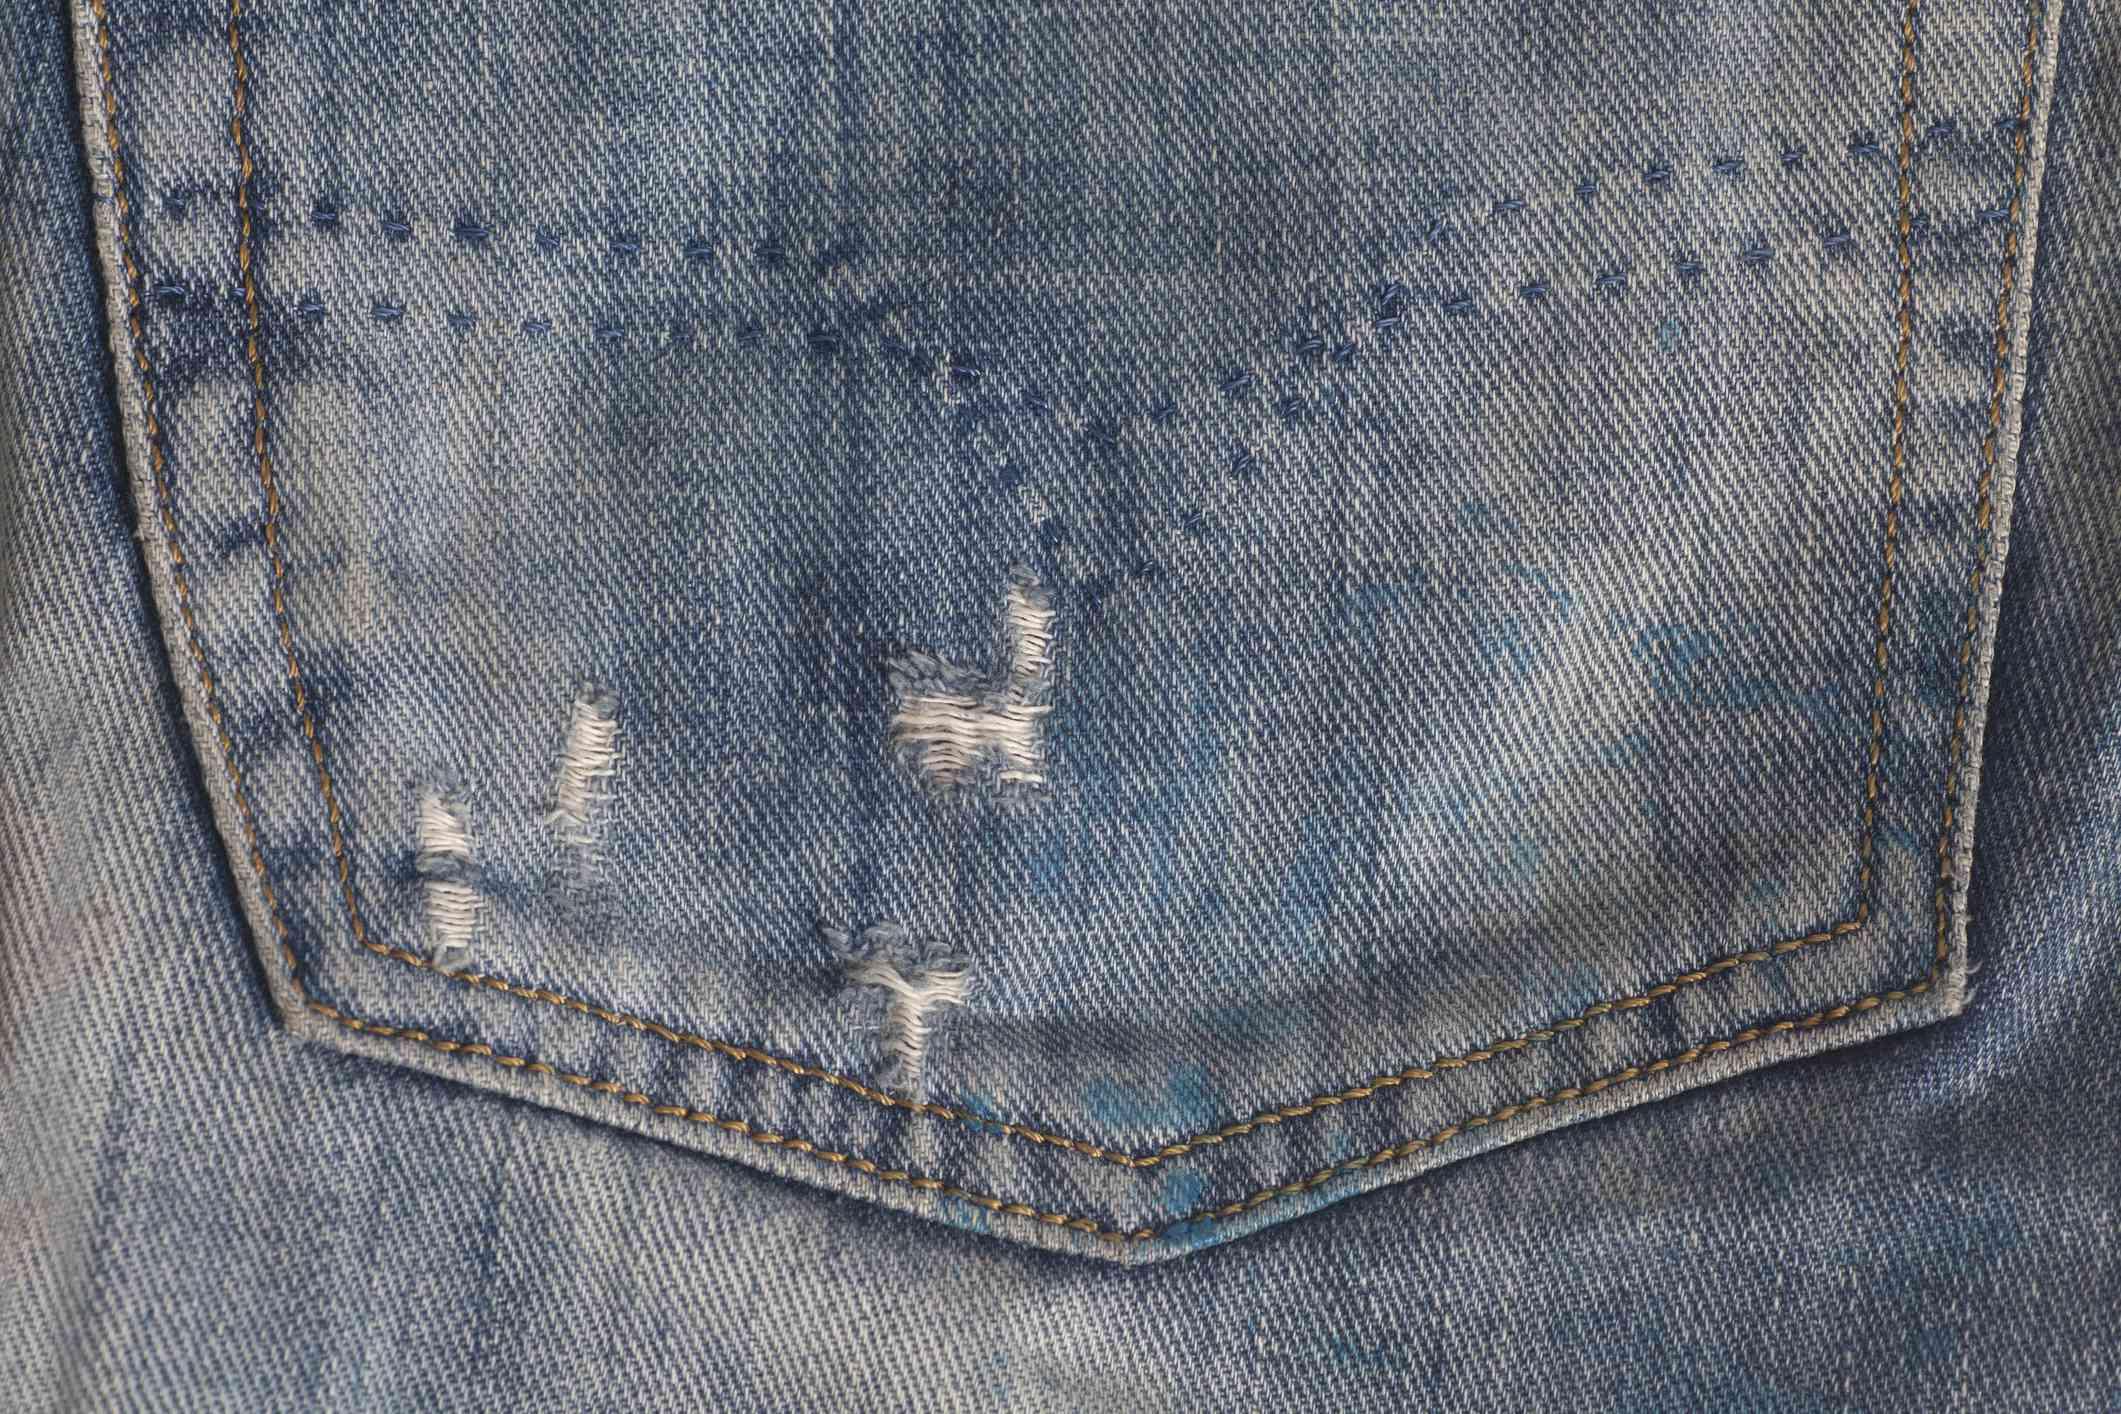 Jeans pocket denim texture background